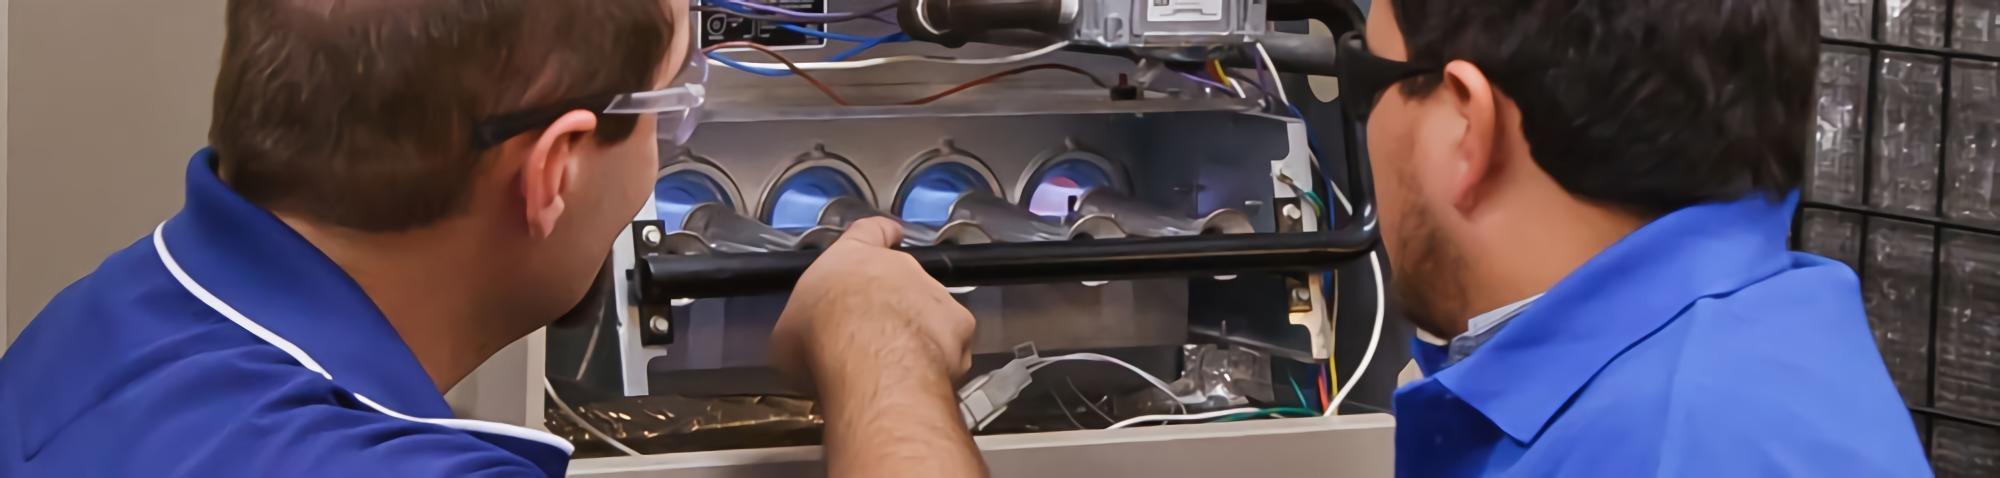 RSI Refrigeration School Training Equipment Student Teacher